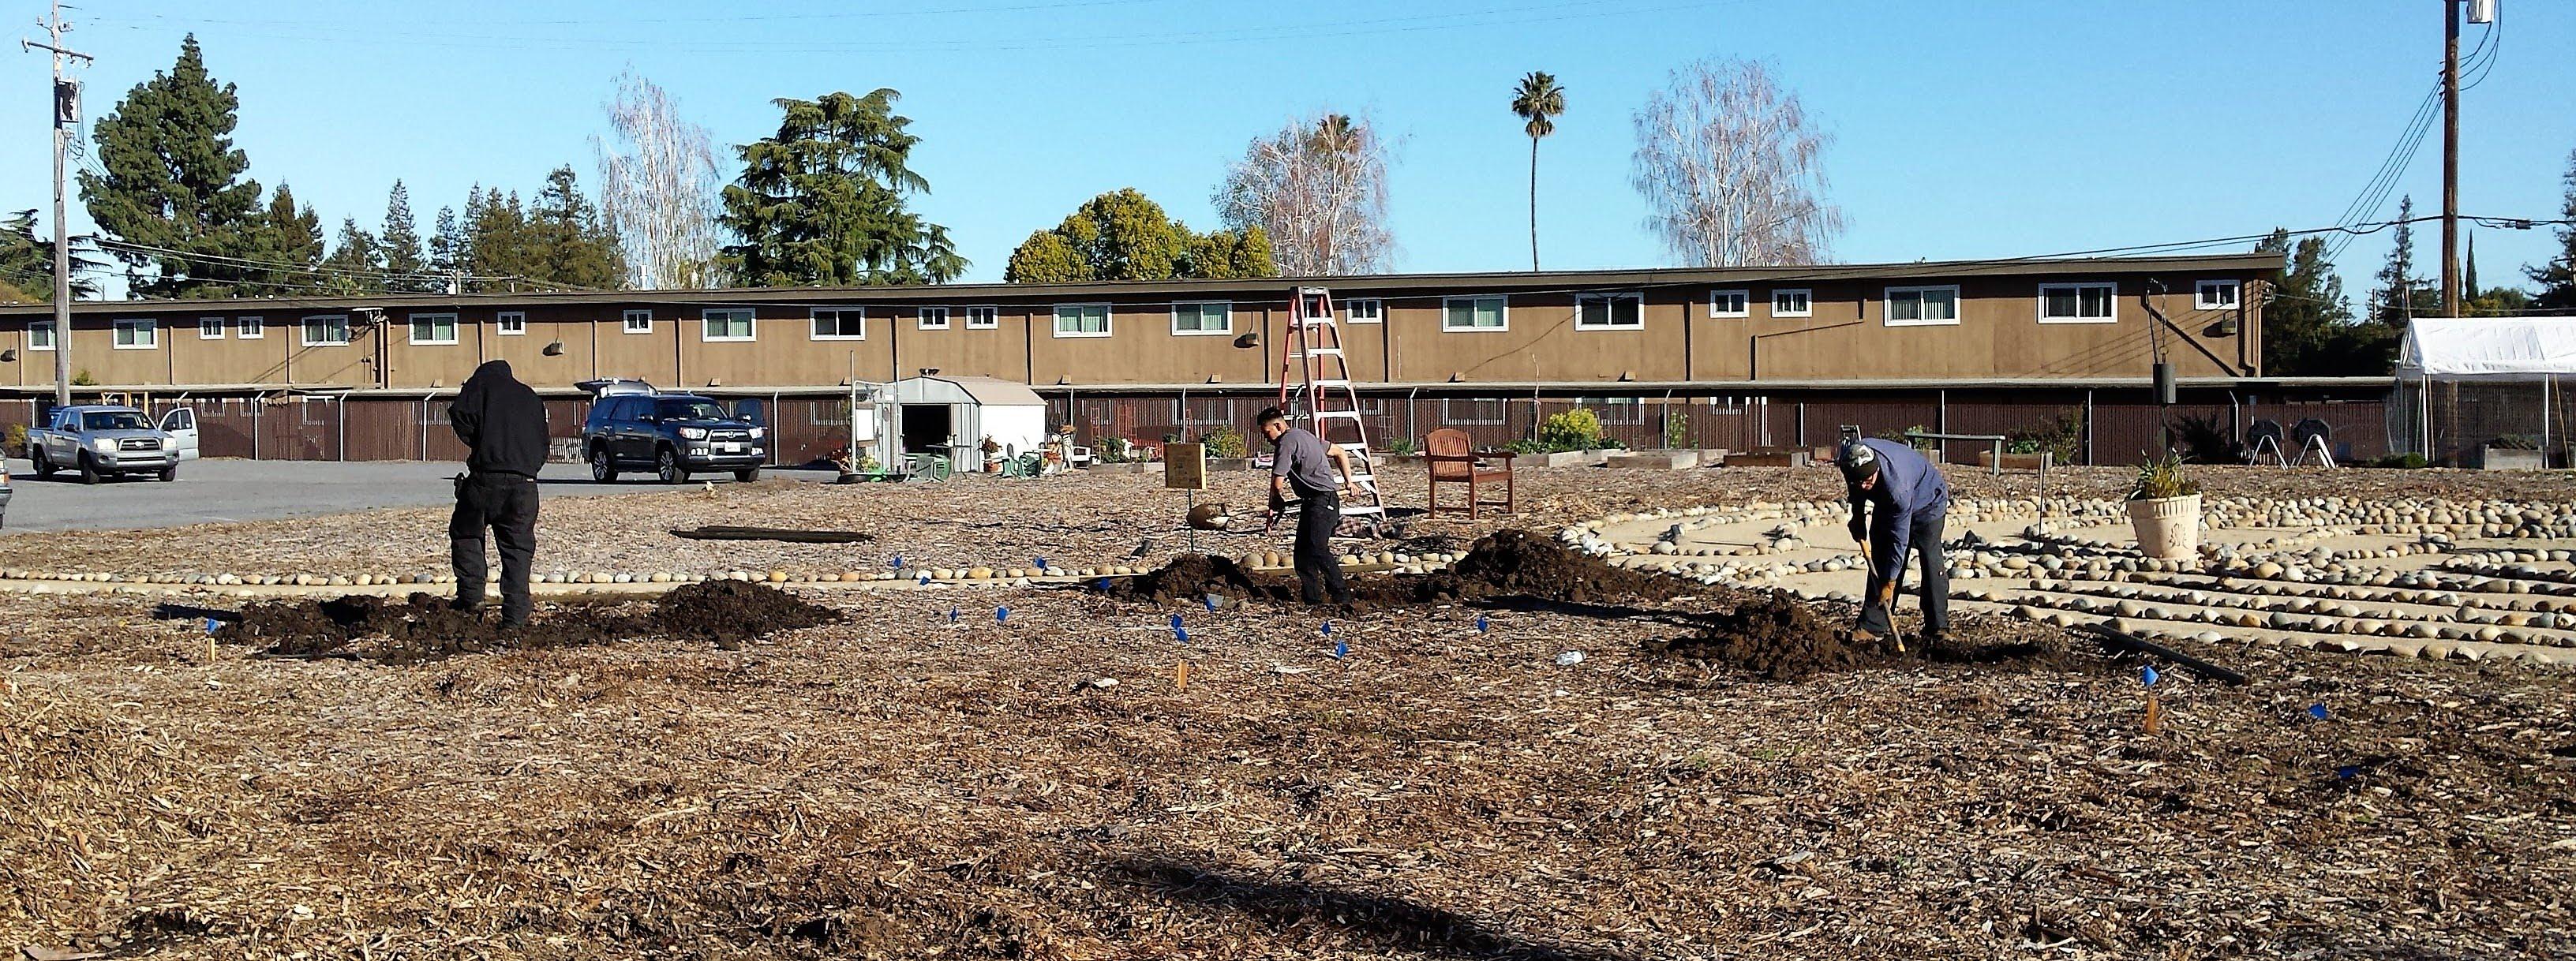 3.13.19 tree planting (5)